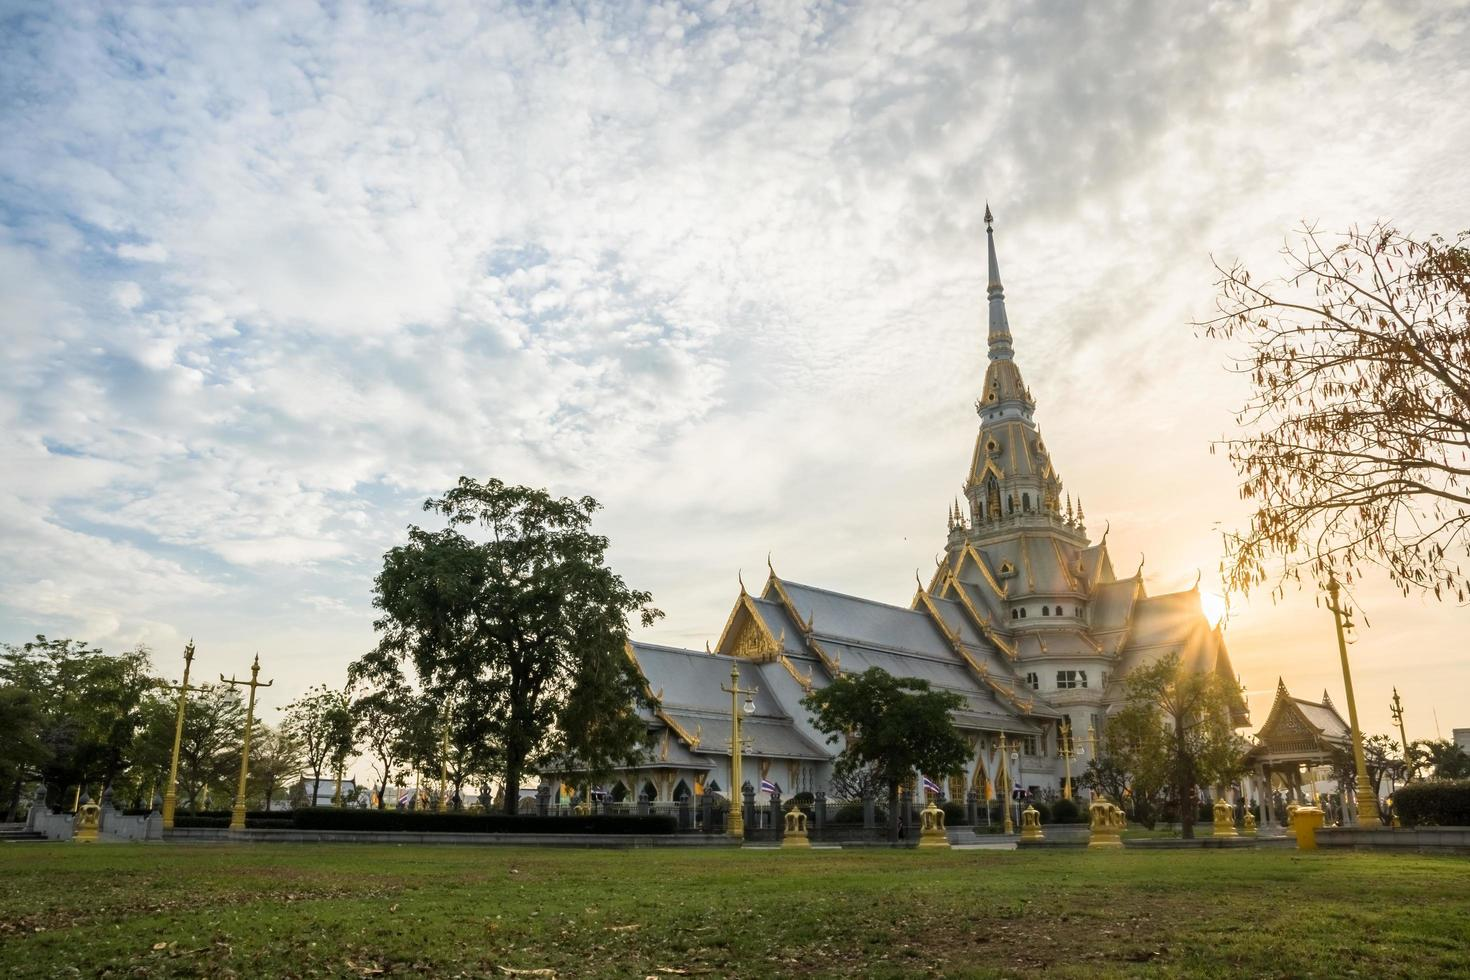 Le temple wat sothon wararam worawihan en Thaïlande photo